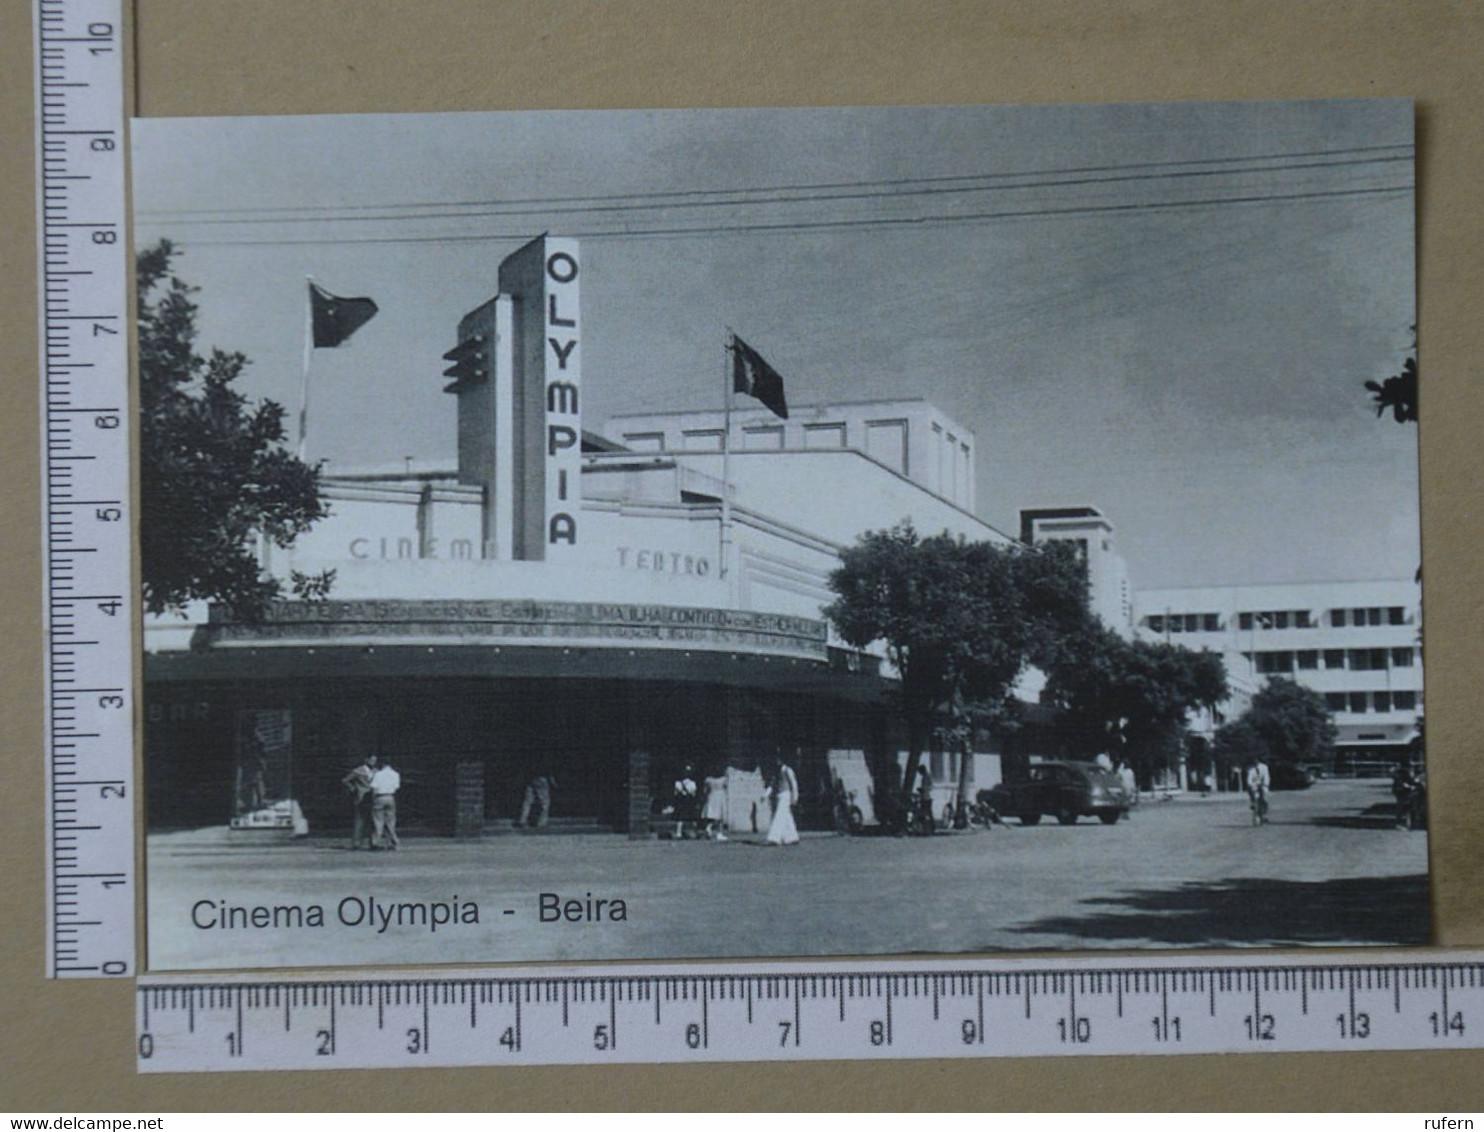 MOZAMBIQUE - CINEMA OLYMPIA -  BEIRA -   2 SCANS  - (Nº42581) - Mozambique